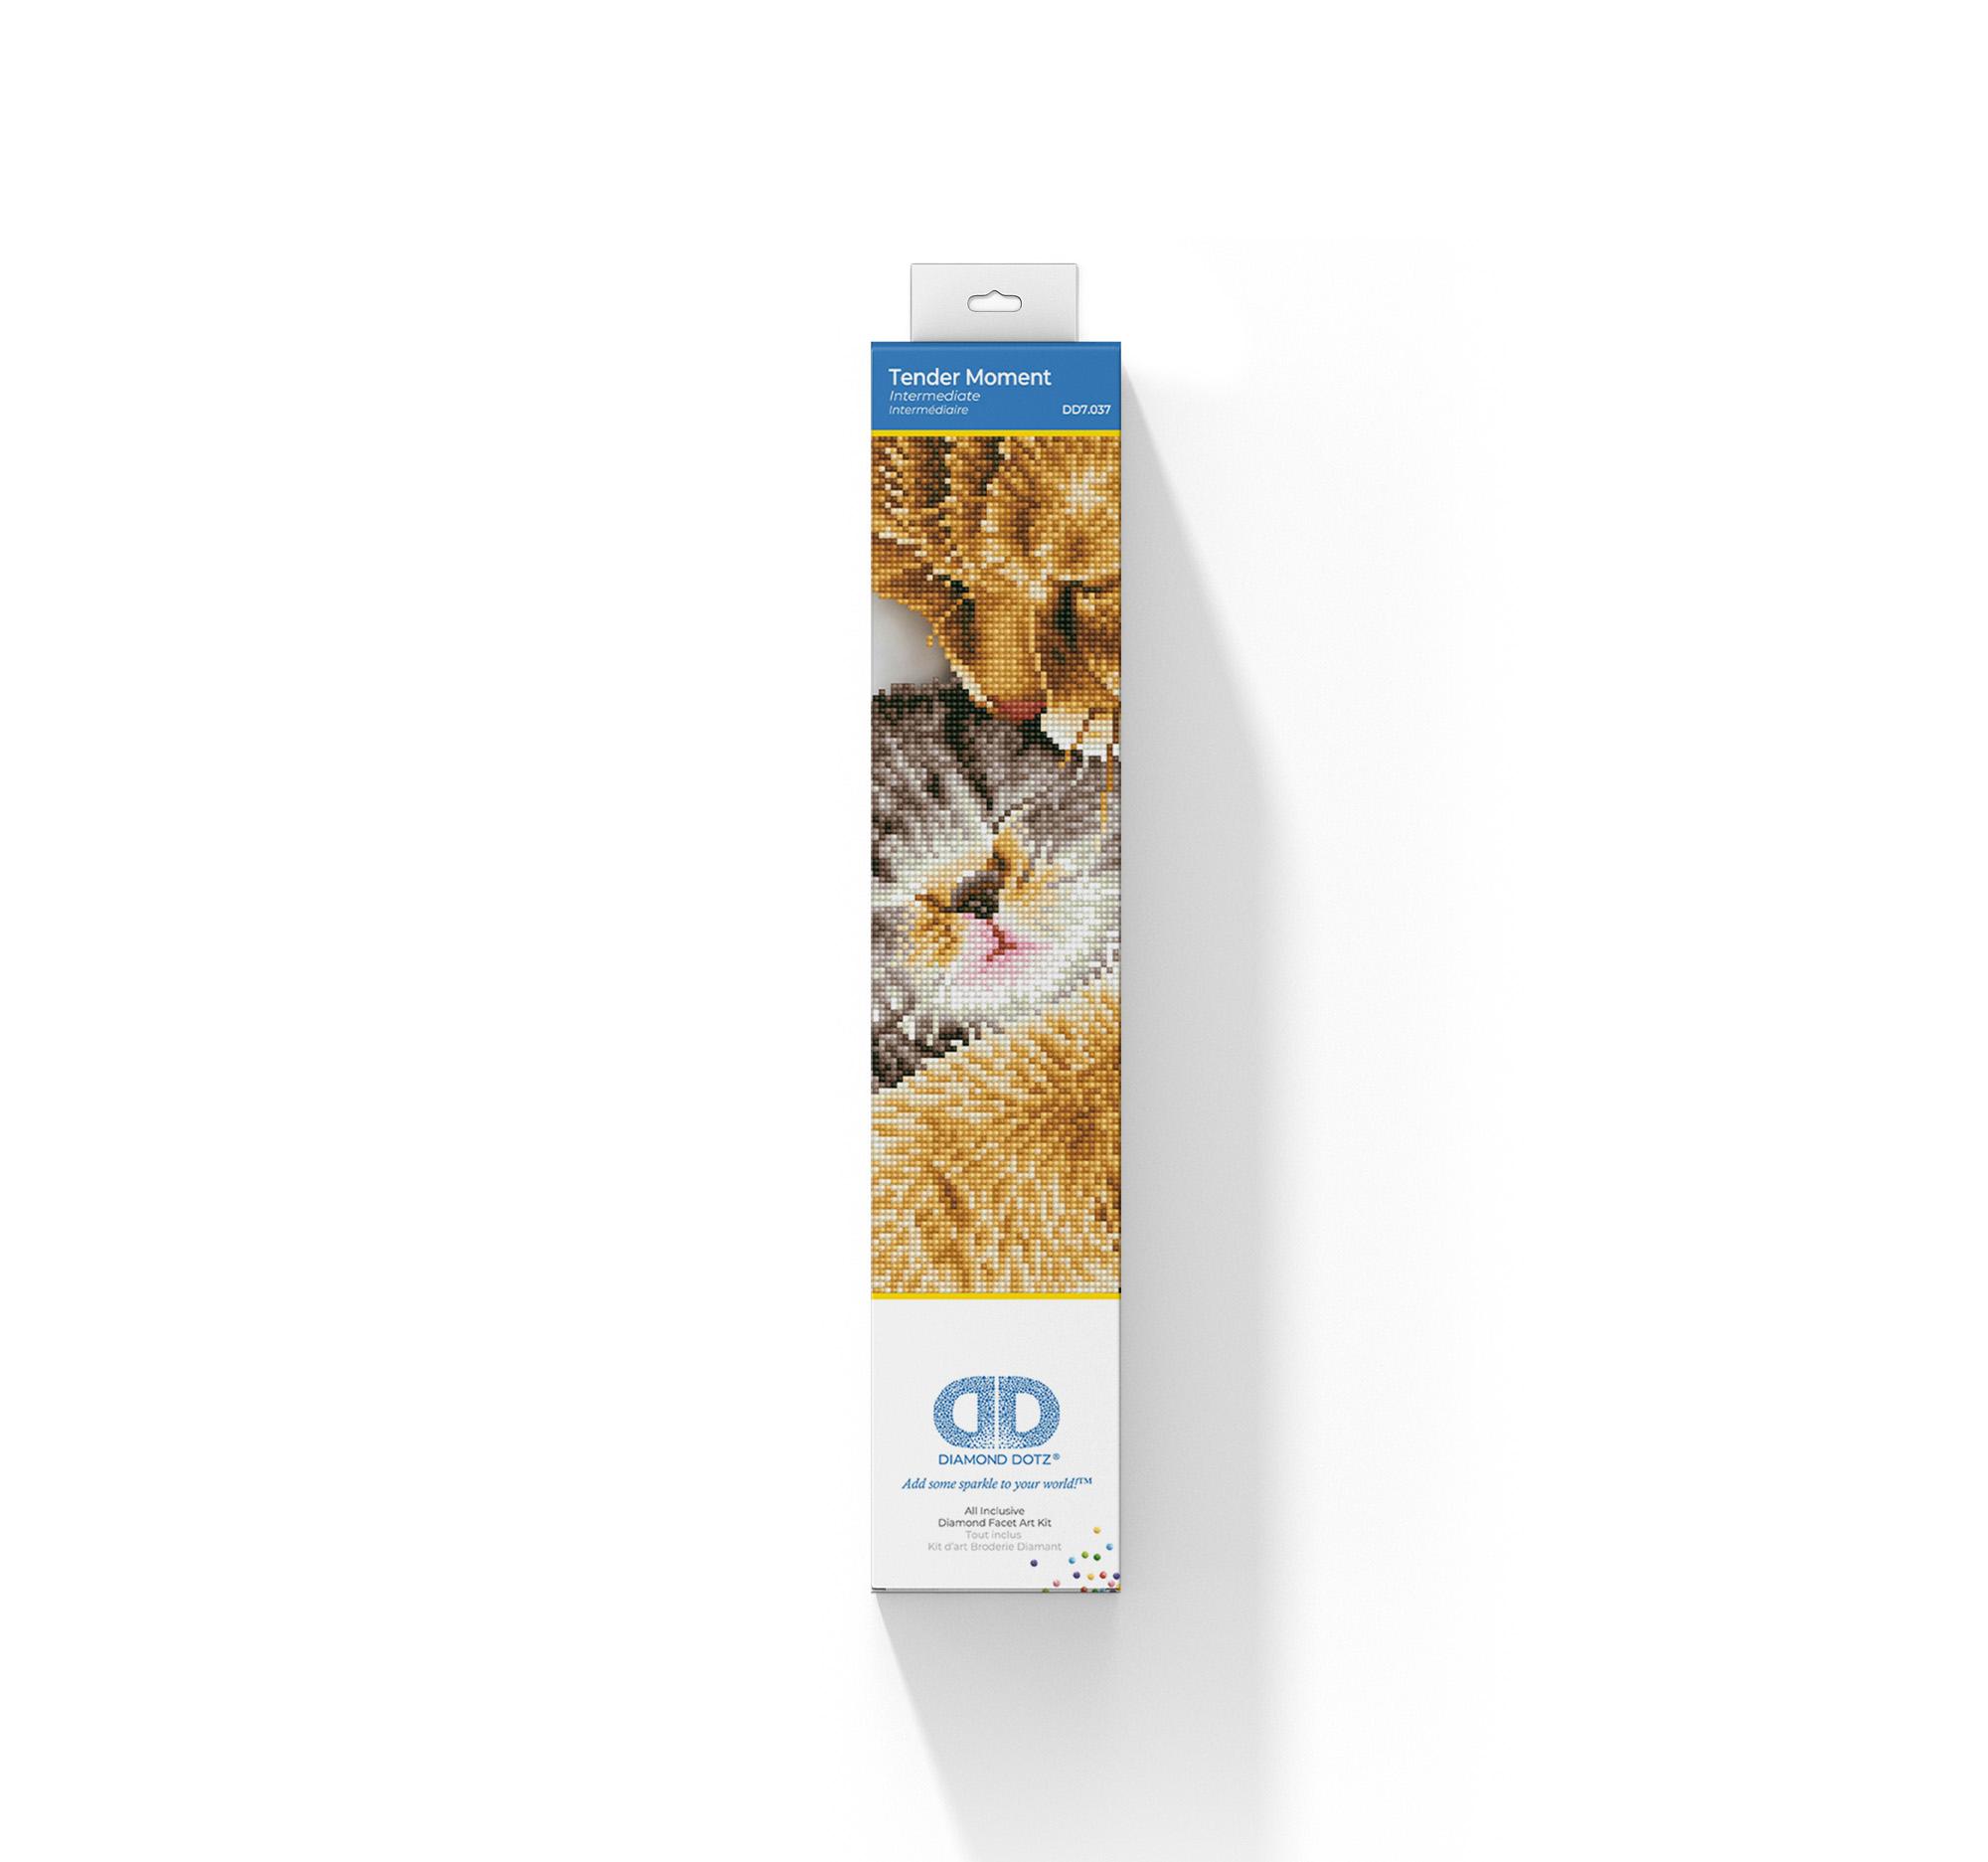 DD7.037_packaging